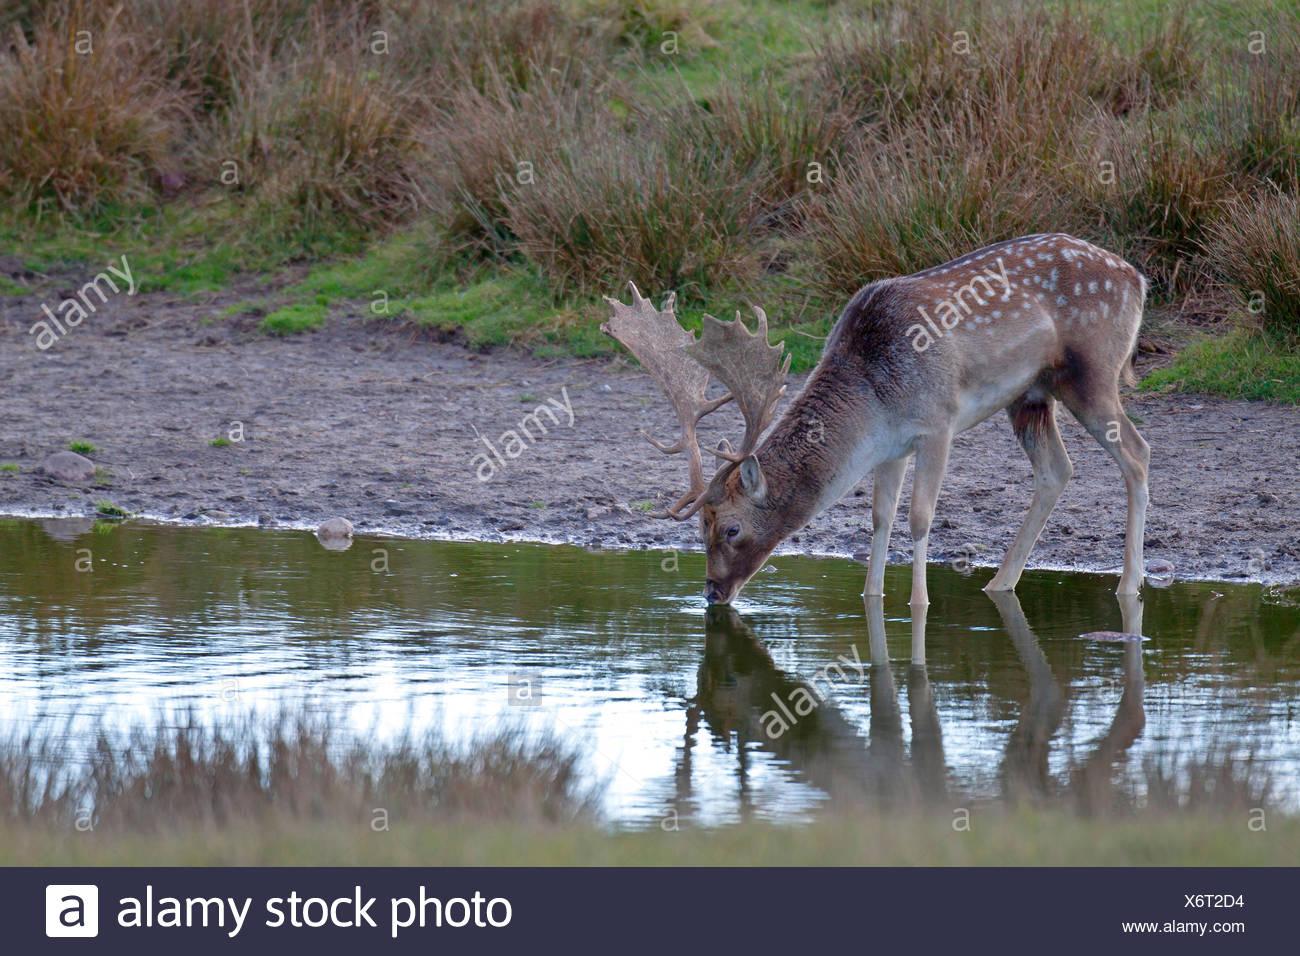 fallow deer (Dama dama, Cervus dama), stag drinking, Denmark, Sjaelland - Stock Image